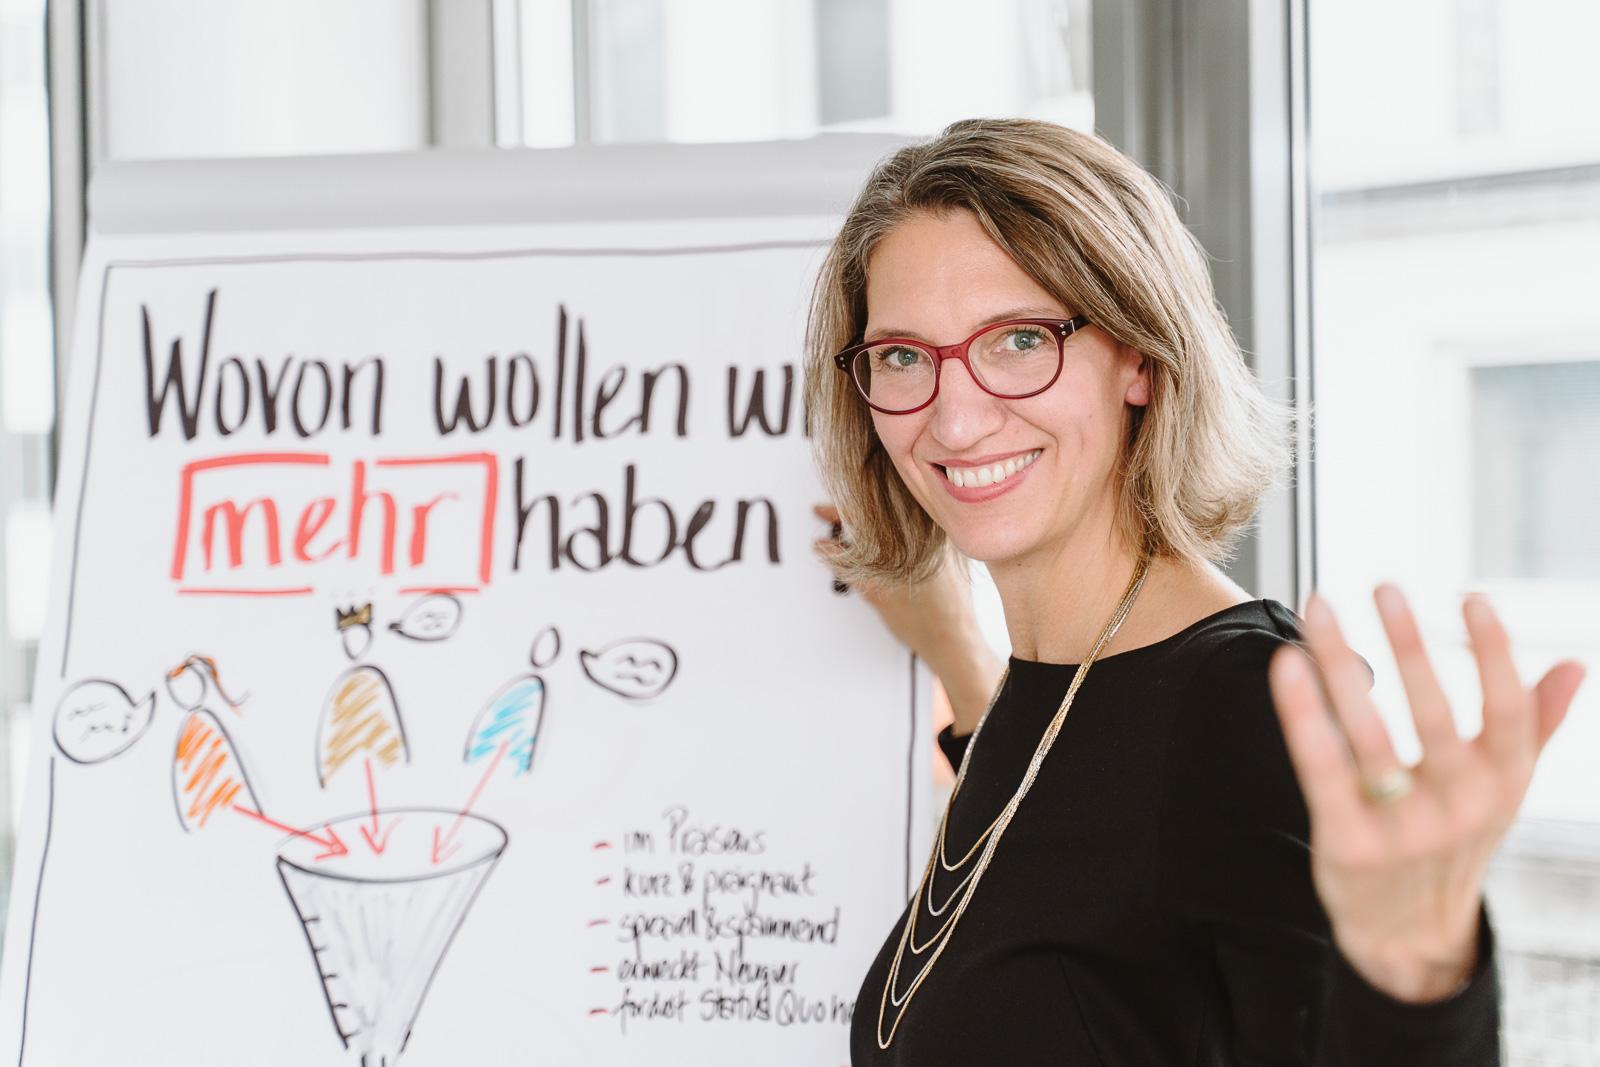 Coach im Seminar einladend - Businessporträts Fotograf Bonn